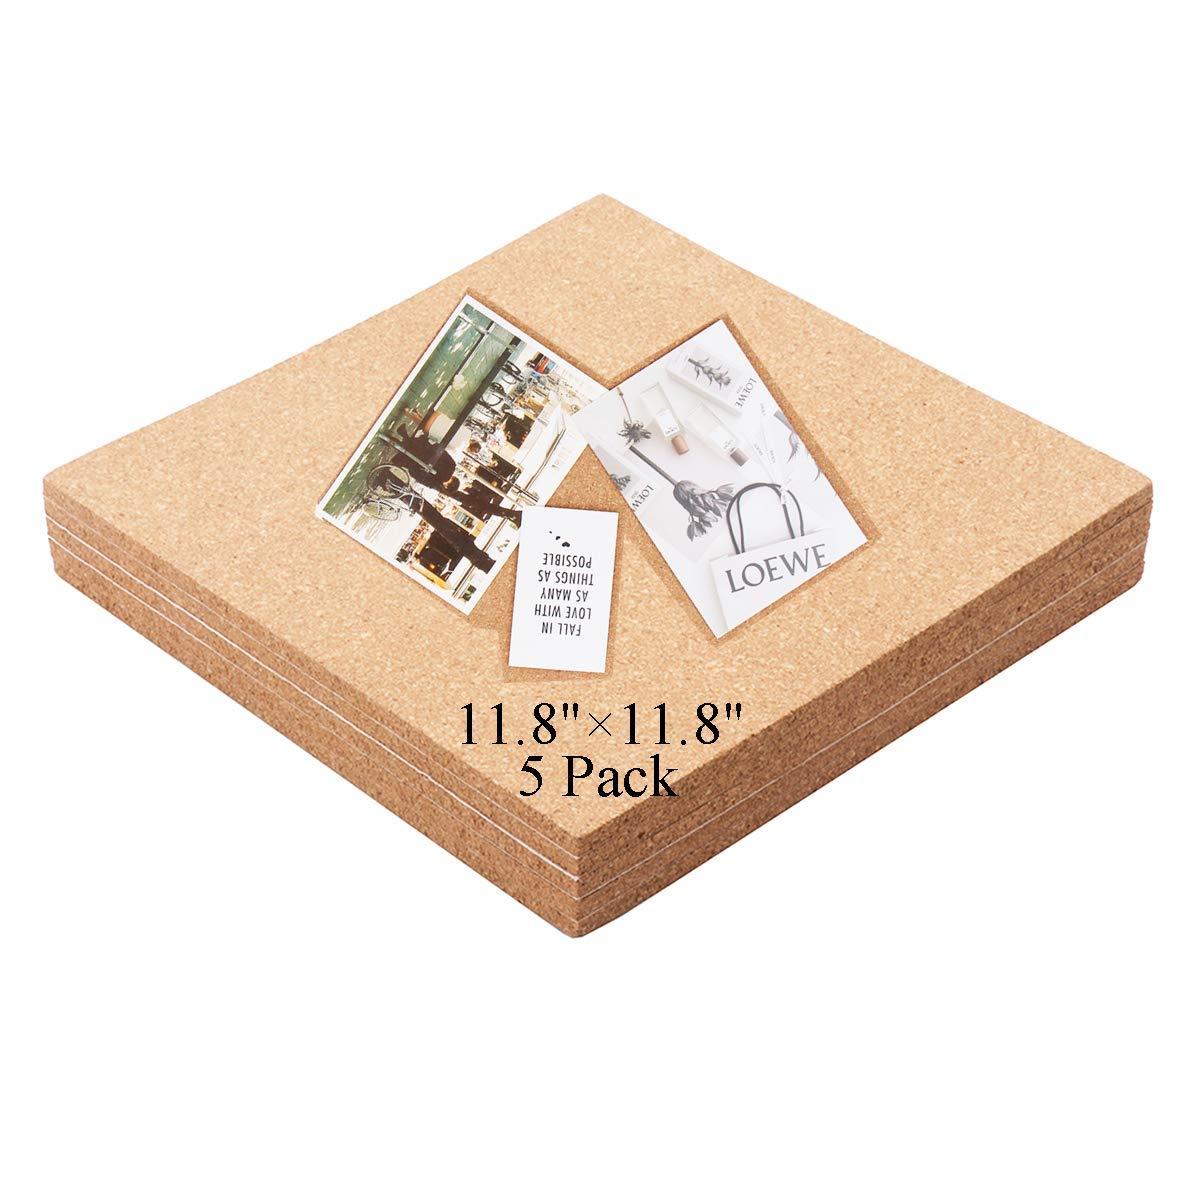 "5 Pack Premium Cork Tiles 11.8""x11.8"" - 1/4"" Thick Self Adhesive Cork Board - Bulletin Board - Mini Wall - Ultra Strong Self Adhesive Backing"